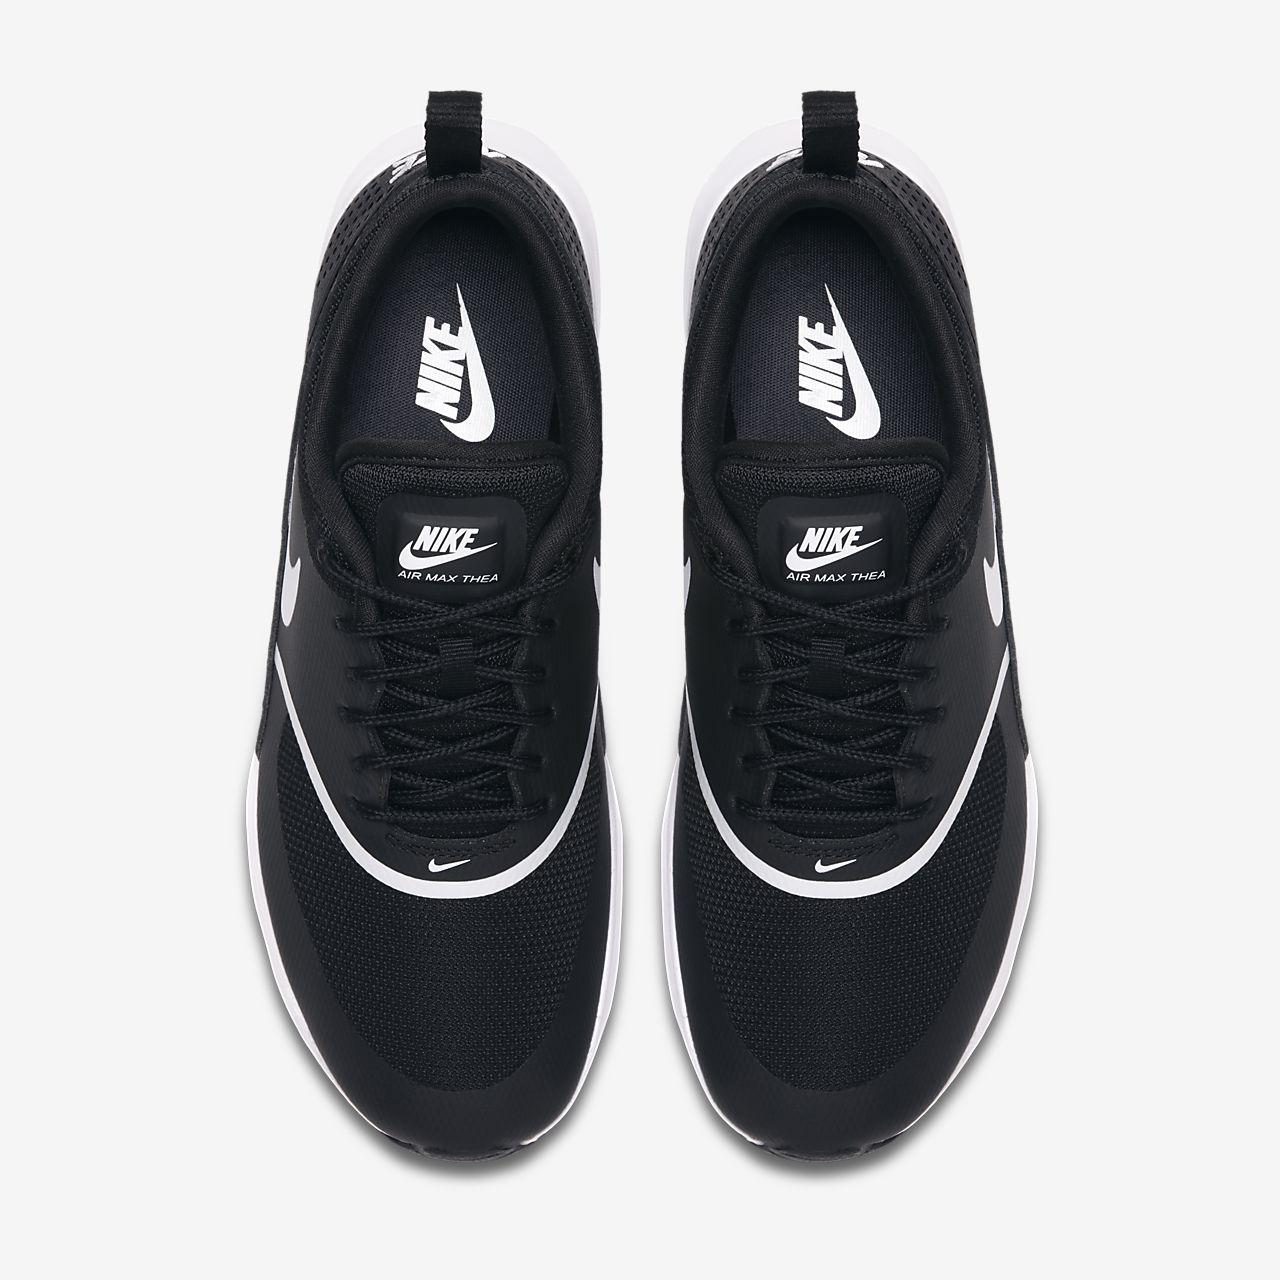 reputable site 0d5ff 7fcec ... Sko Nike Air Max Thea för kvinnor